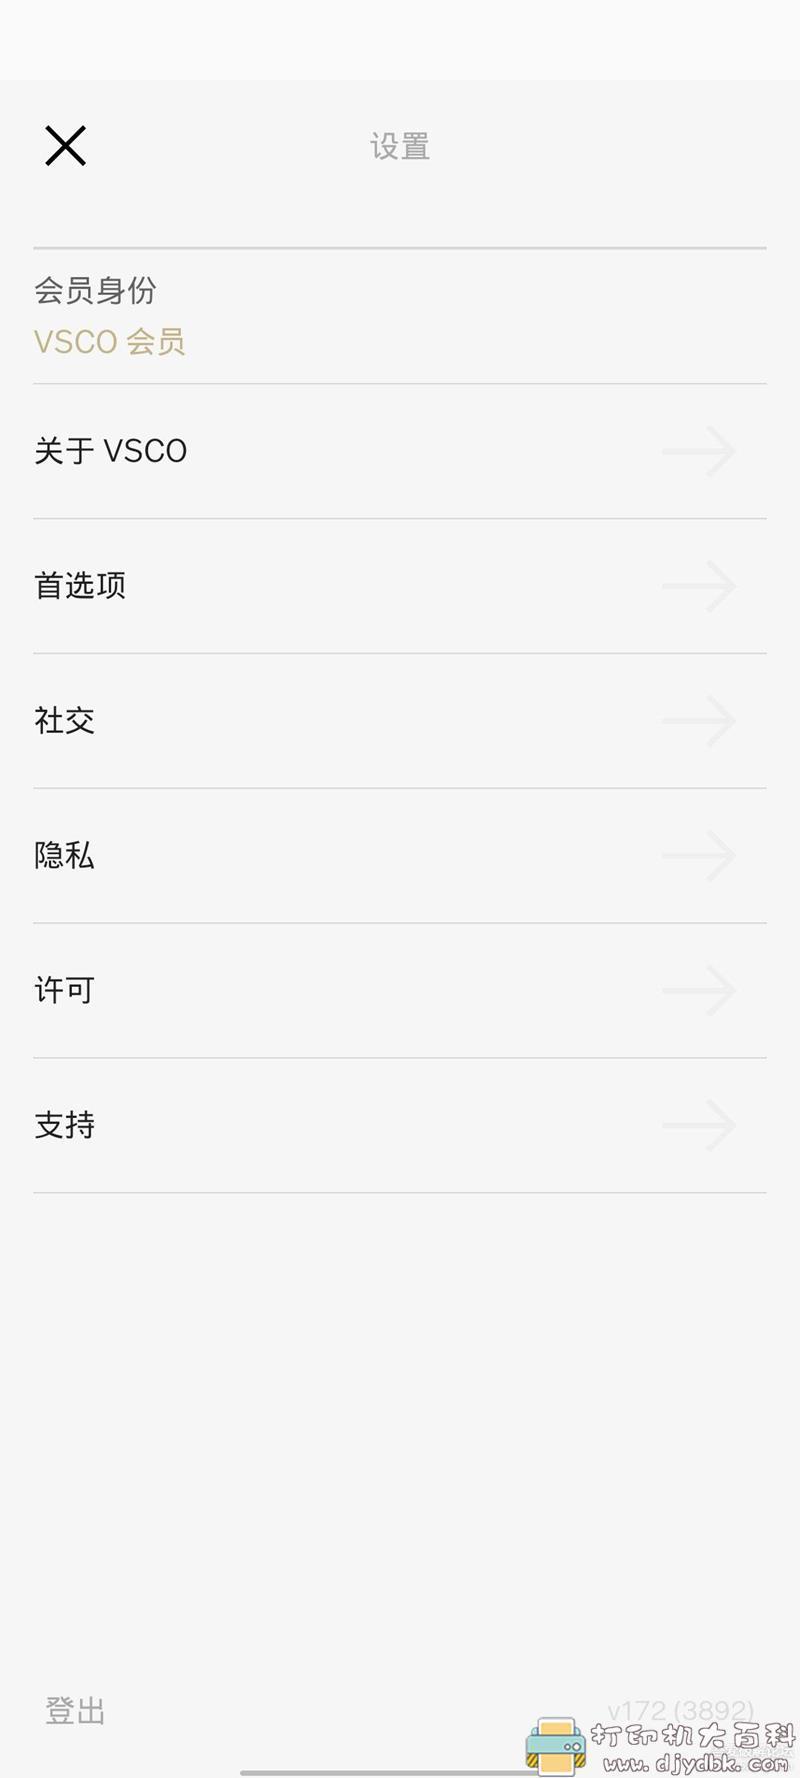 [Android]手机滤镜软件 VSCO 172版本 已解锁(2020.7.9 更新) 配图 No.2